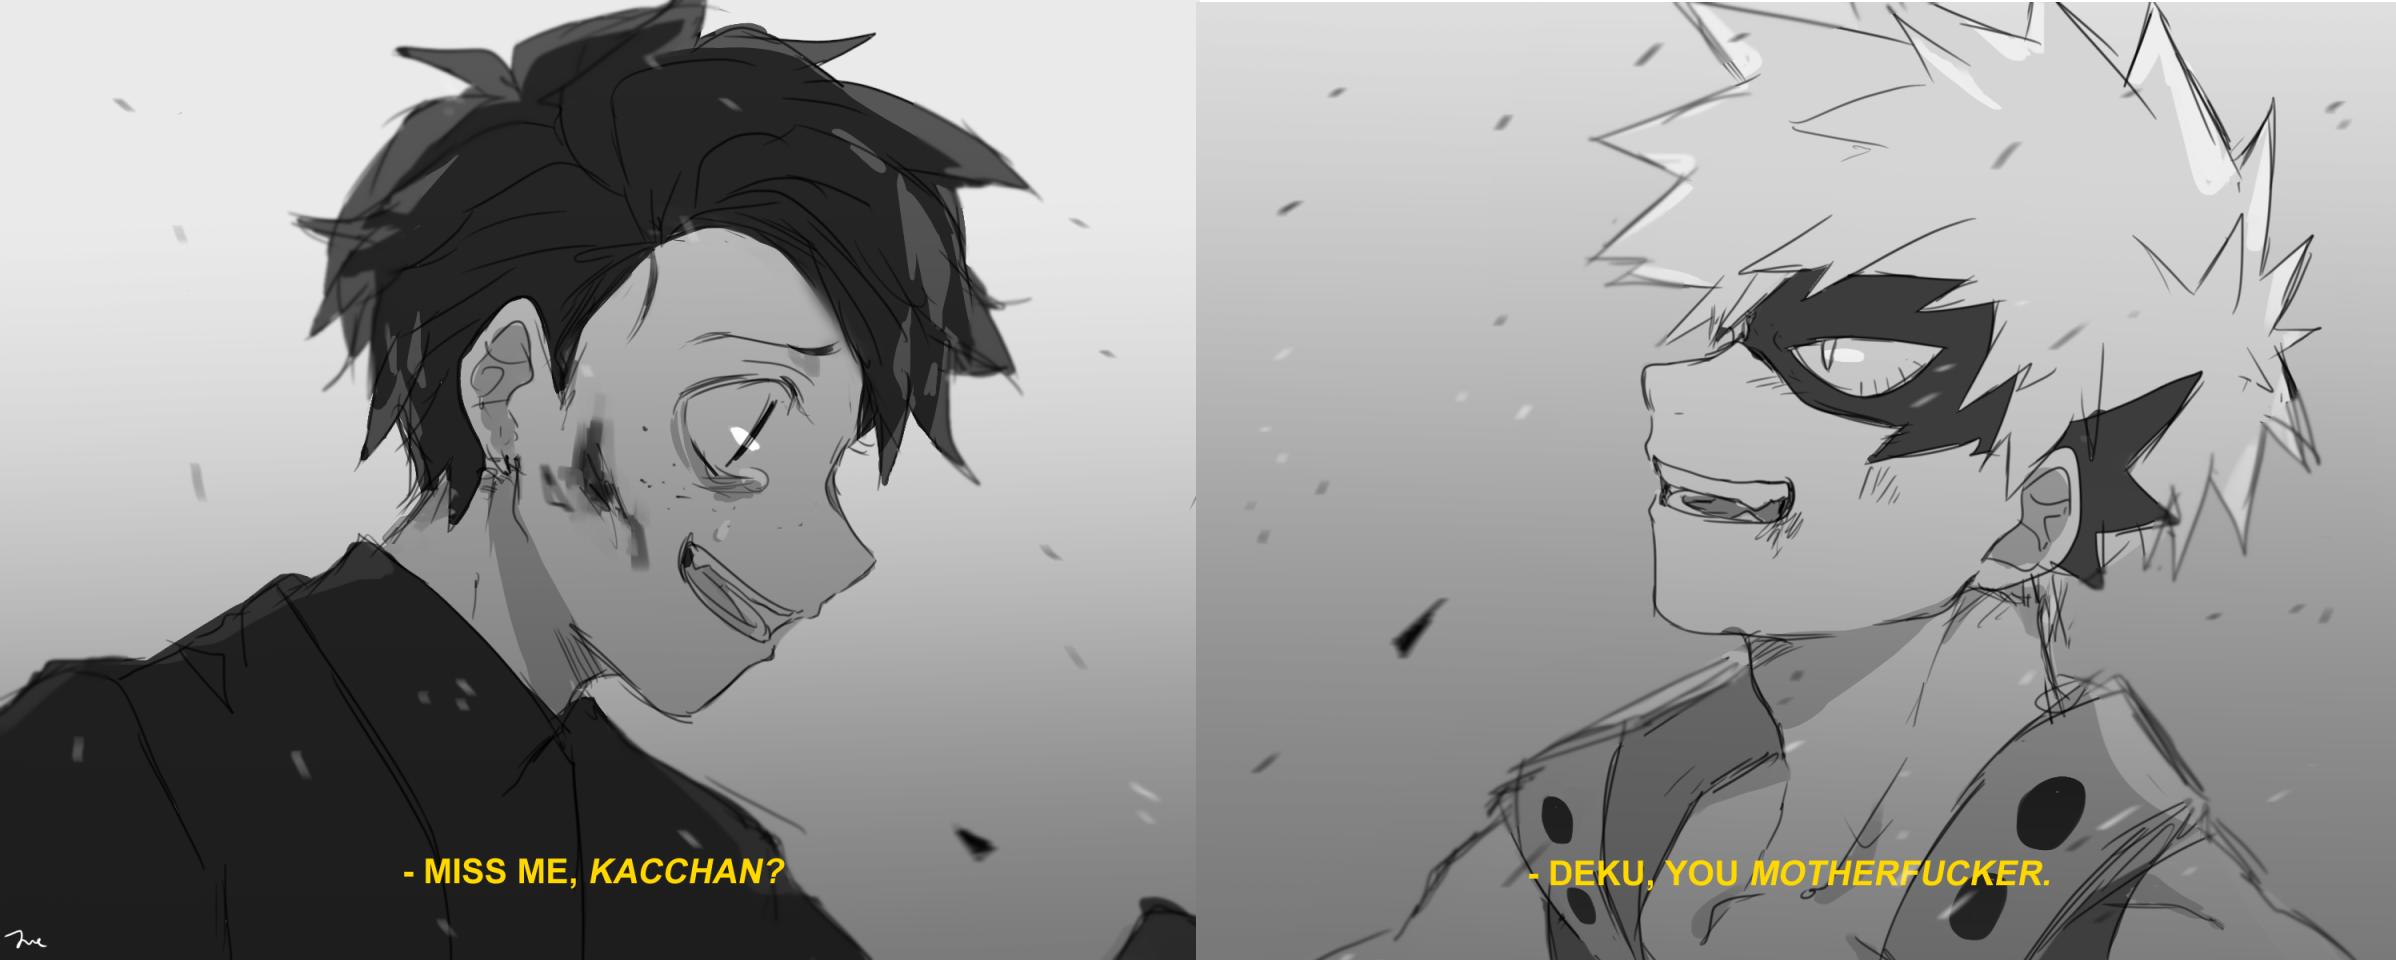 BNHA Izuku (Villain), Katsuki | My Hero Academia | My hero academia